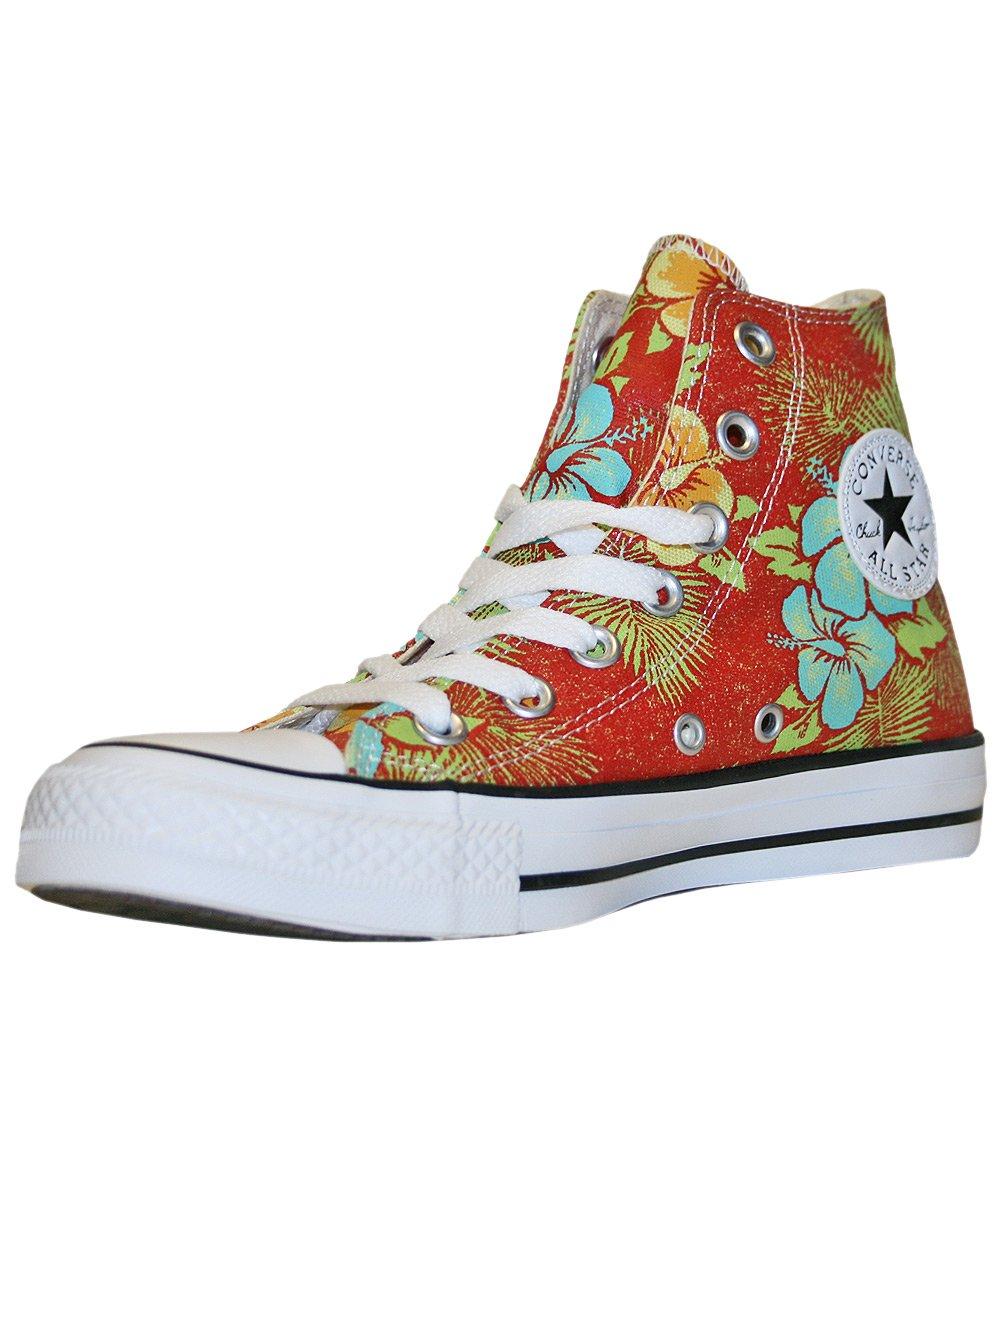 Converse Damen Schuh All Star Converse 9634 Schuh